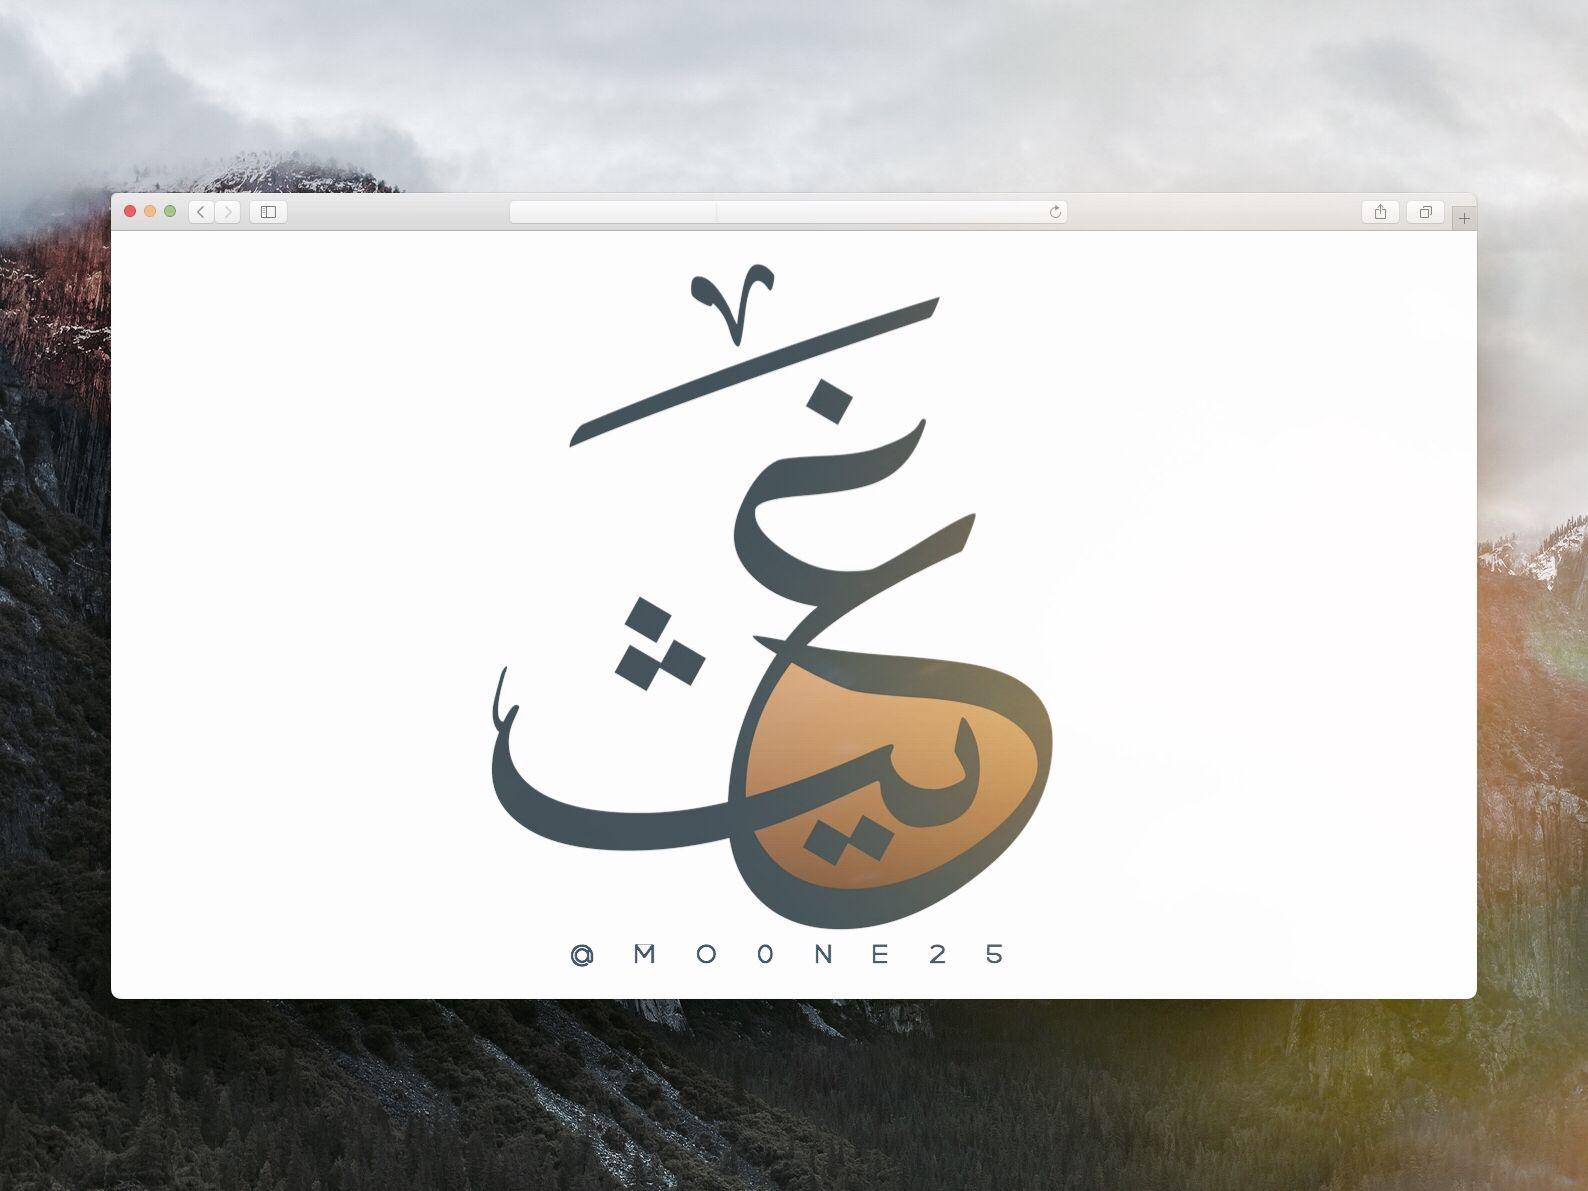 Pin By Nasora On Art Arabic Calligraphy Art Calligraphy Art Mobile Wallpaper